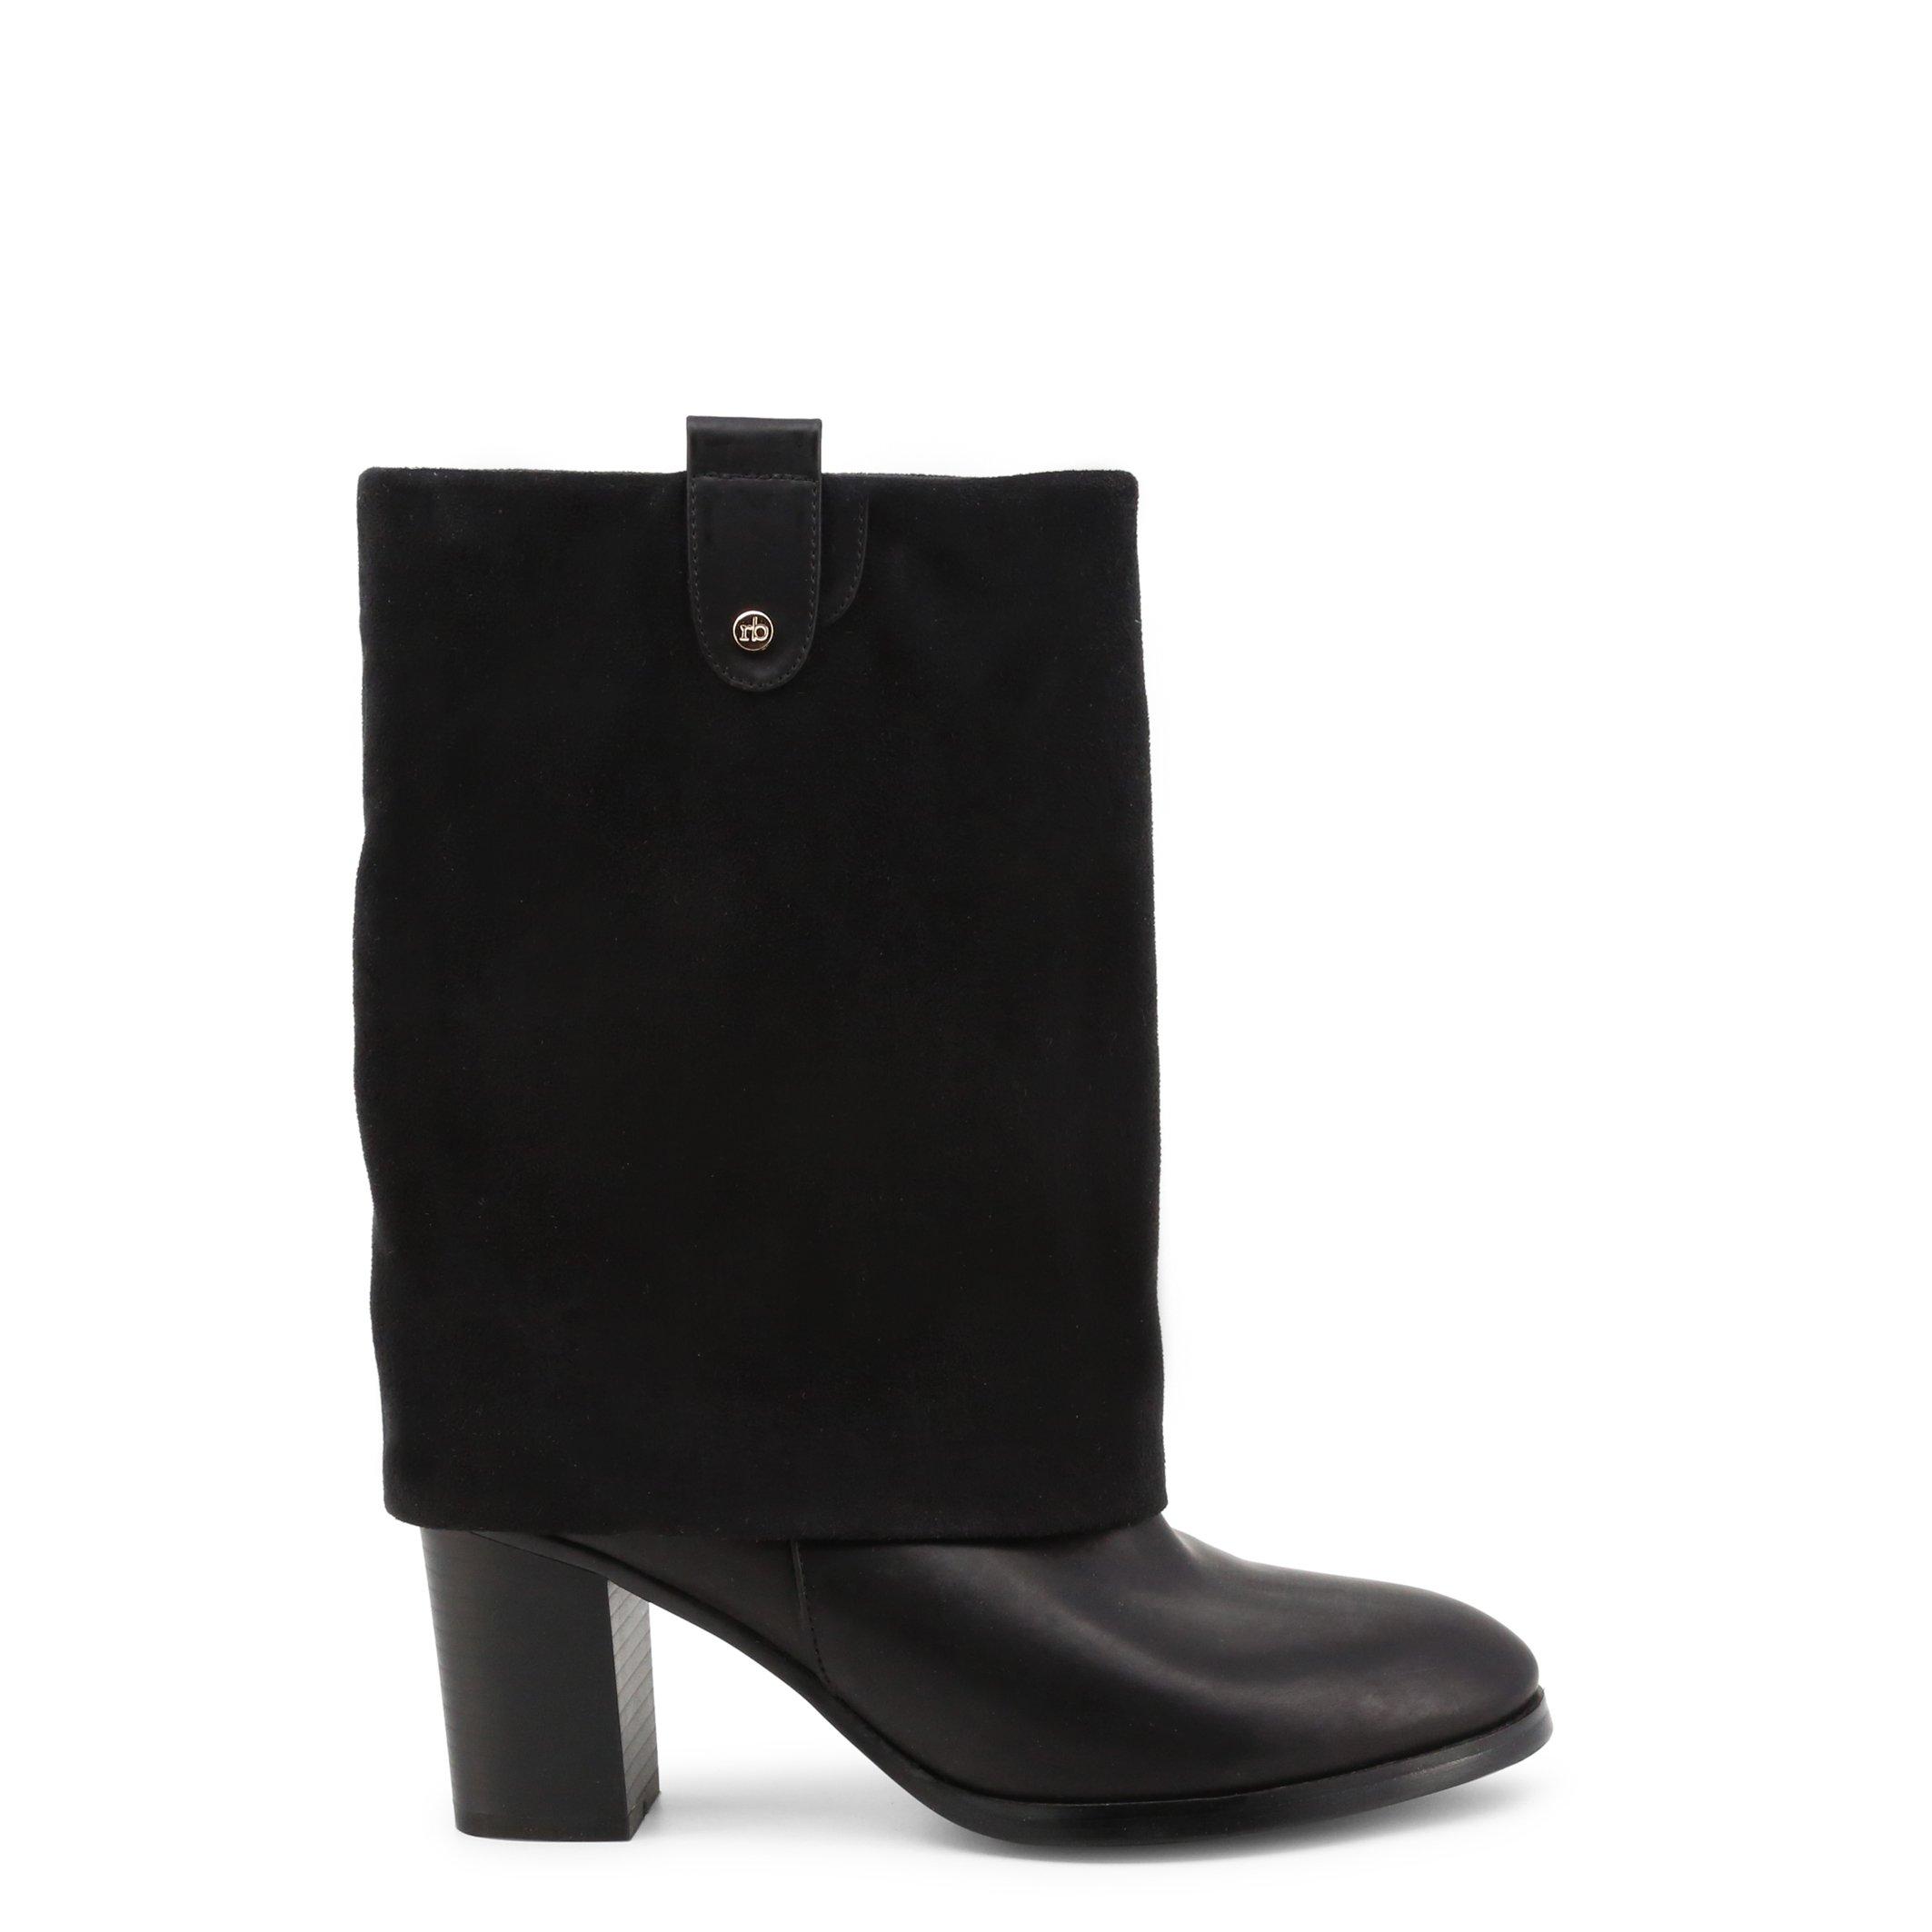 Roccobarocco Women's Ankle Boots Brown 341578 - black EU 37